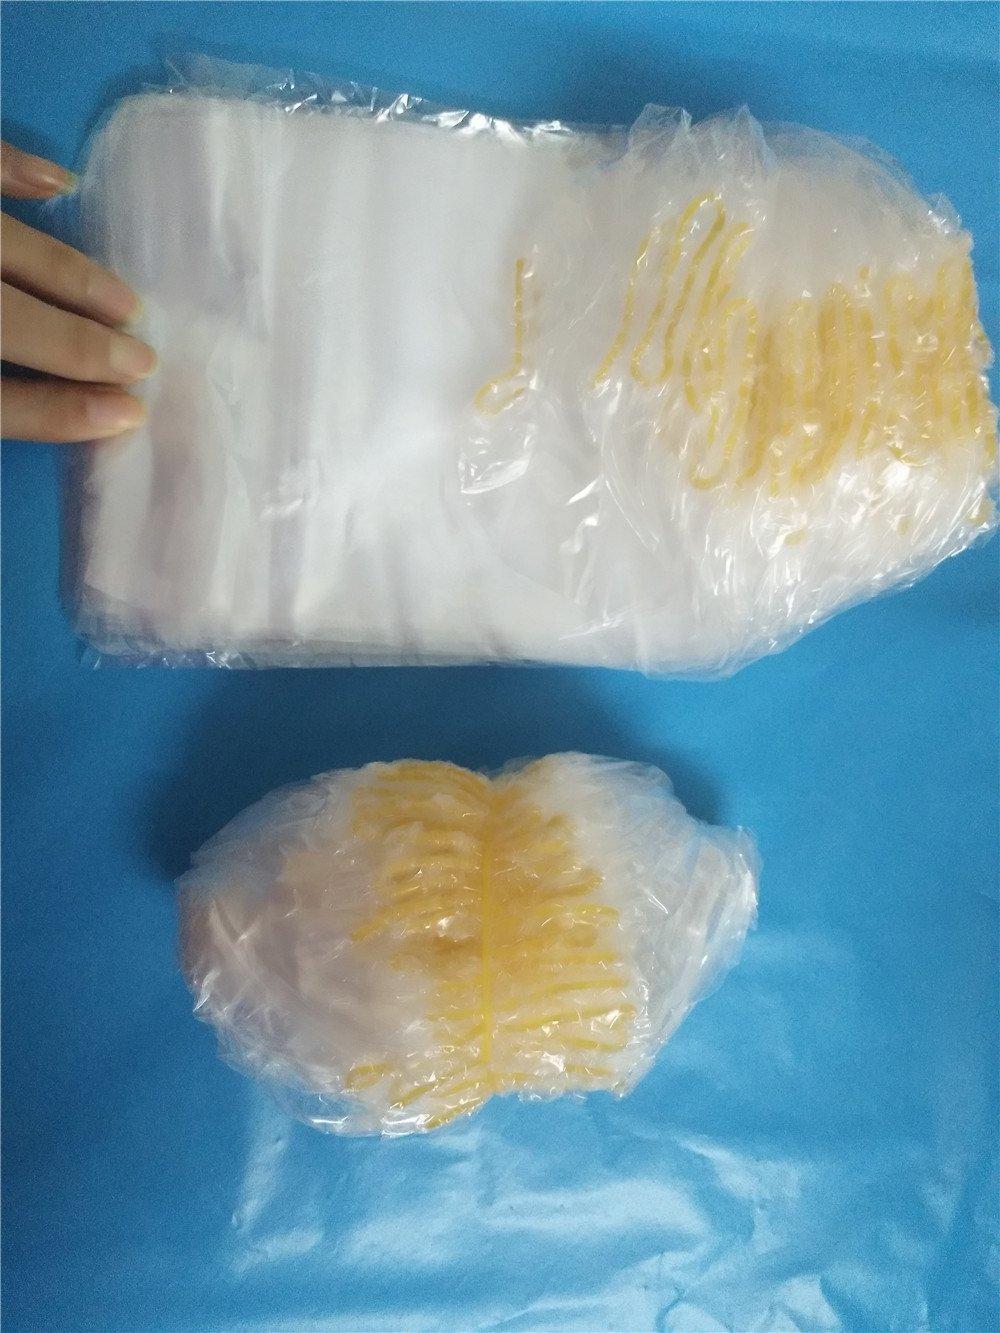 Rousu Medi Drainable Urostomy Bag after Colostomy Ileostomy Pouch Ostomy Belt with Bag